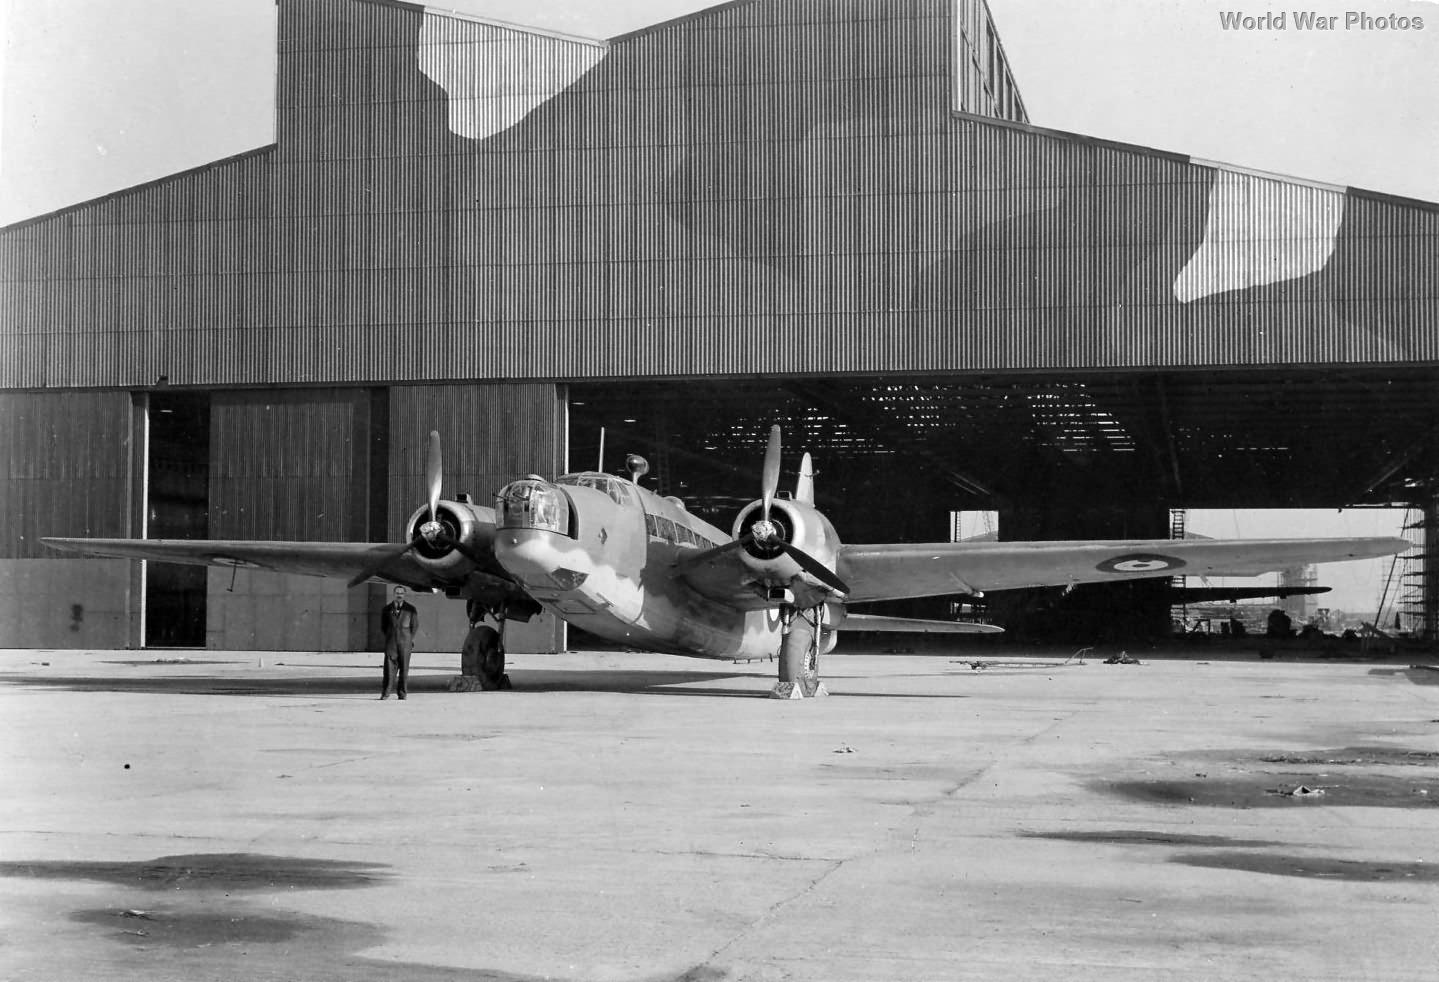 Vickers Wellington Mk IV Prototype R1220 Chester 1941